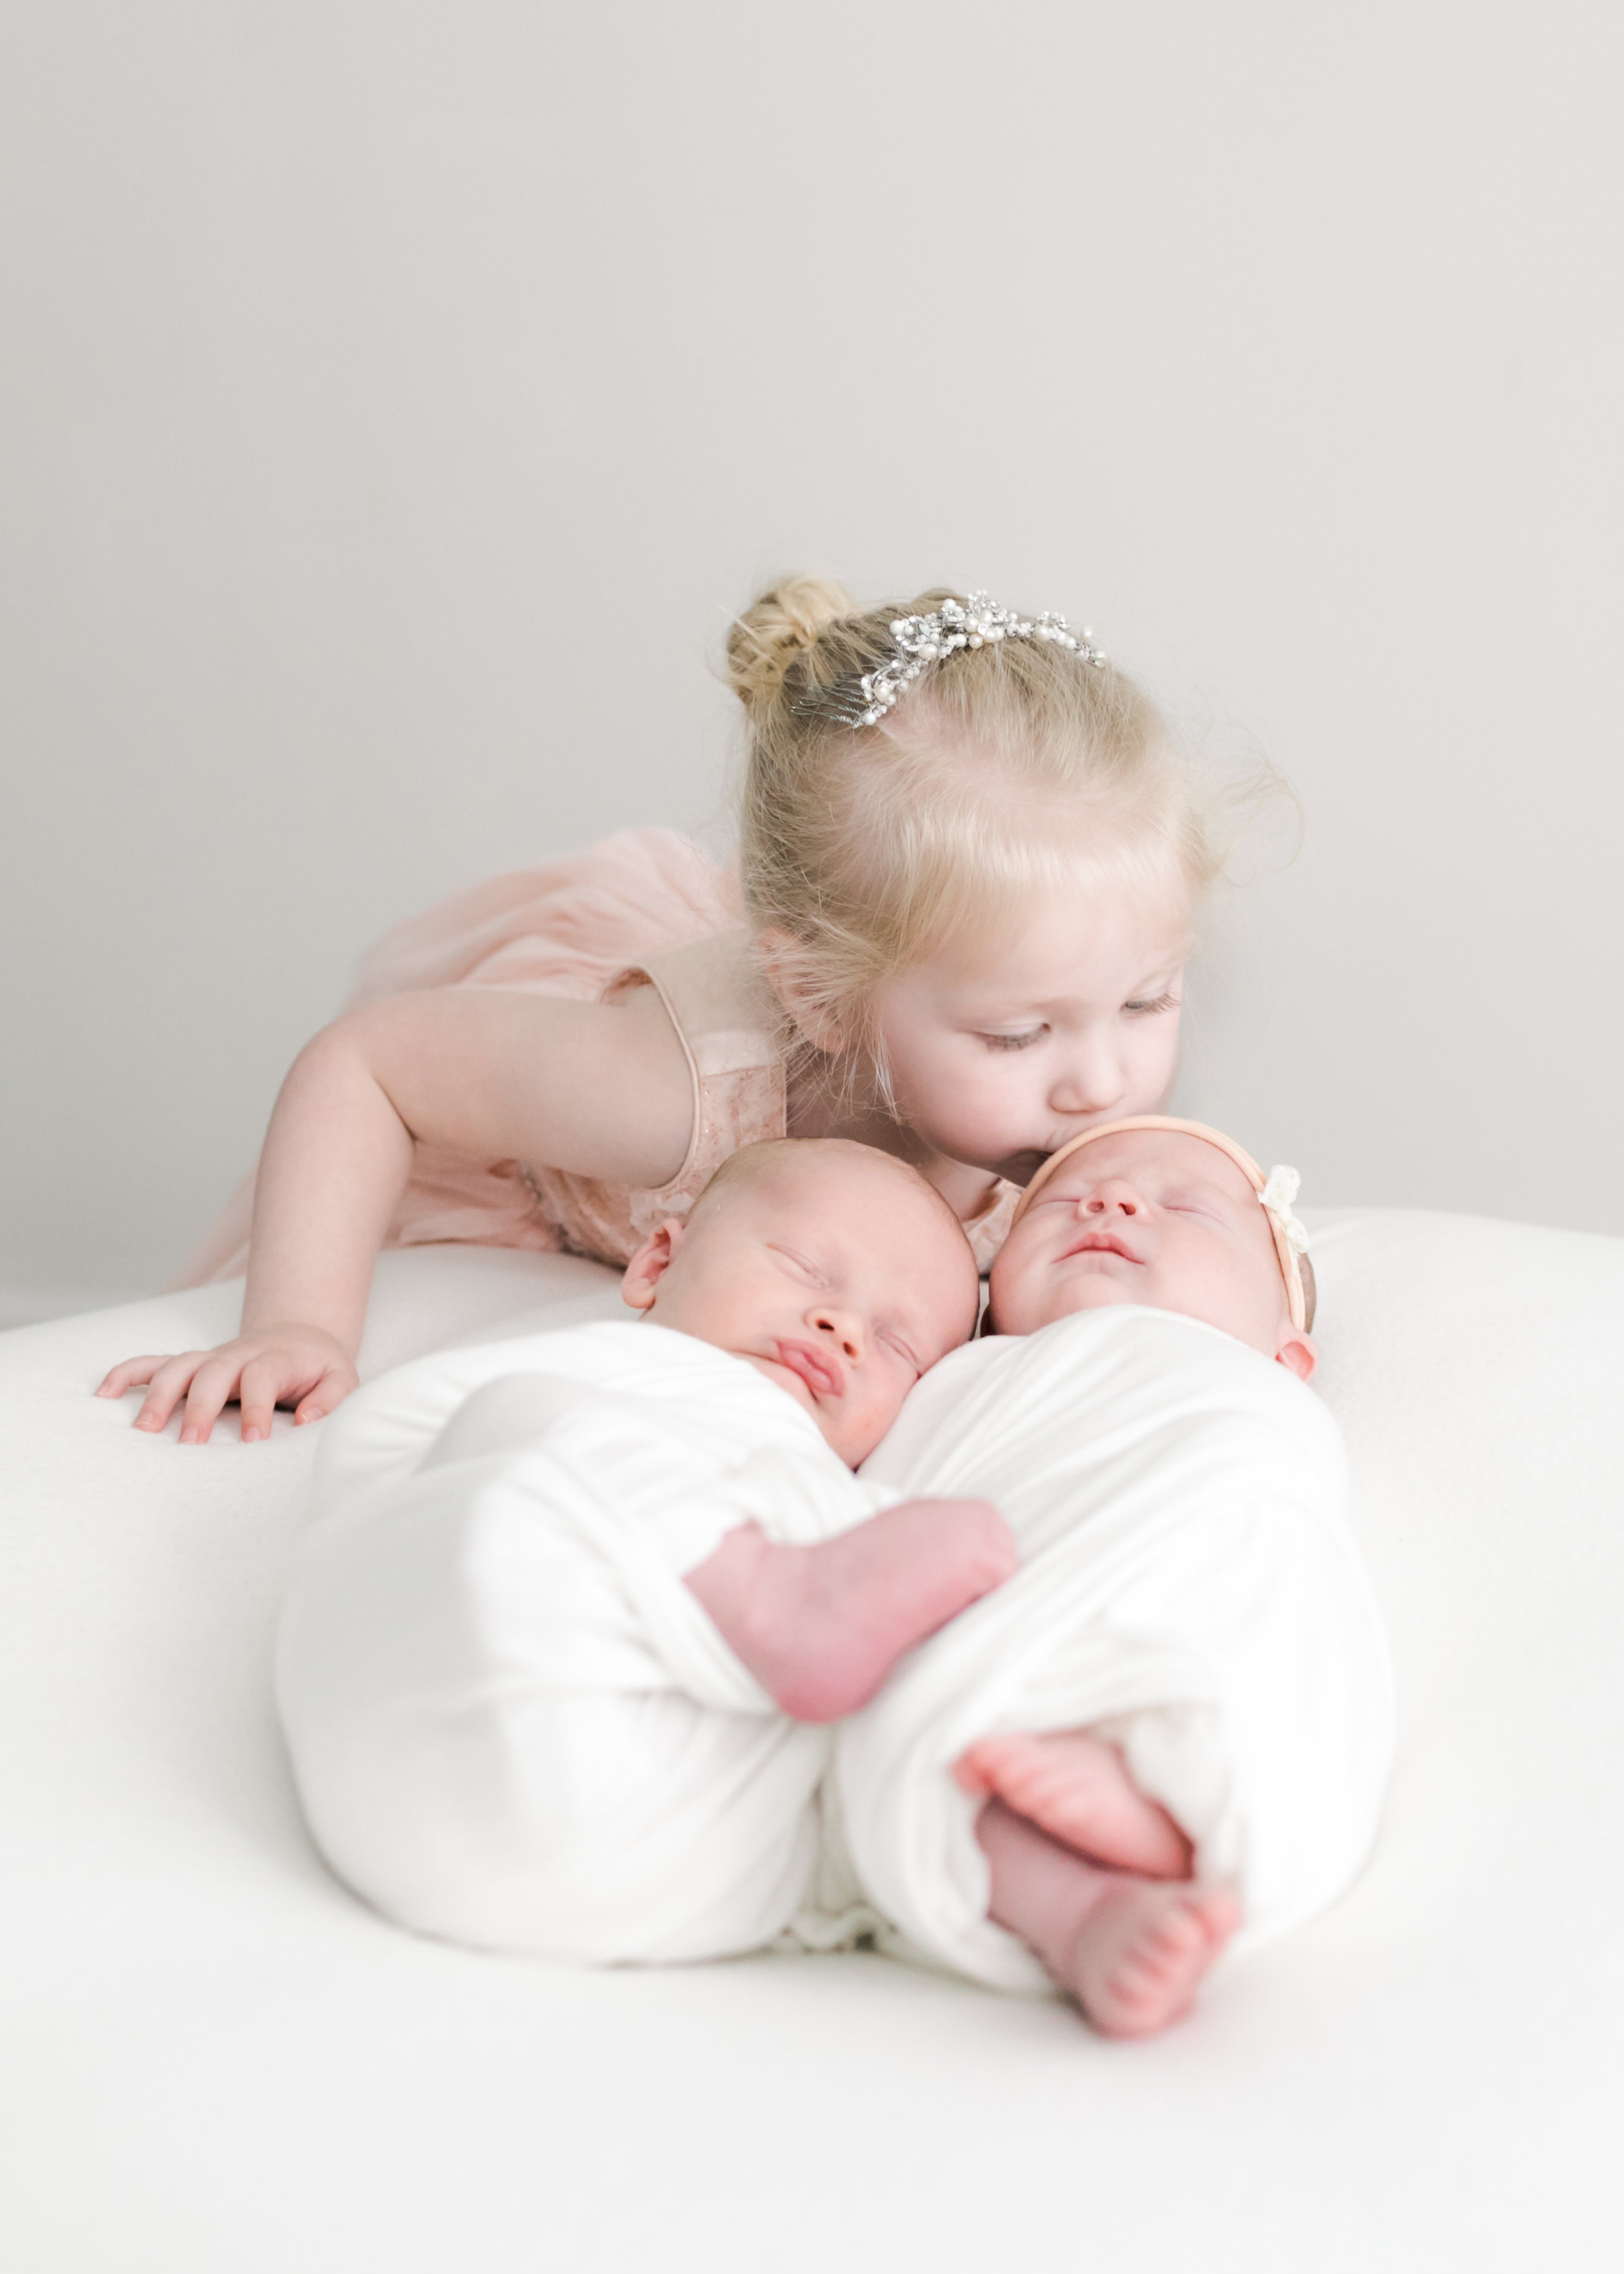 Katie-Newborn-Twins-2019-043.JPG